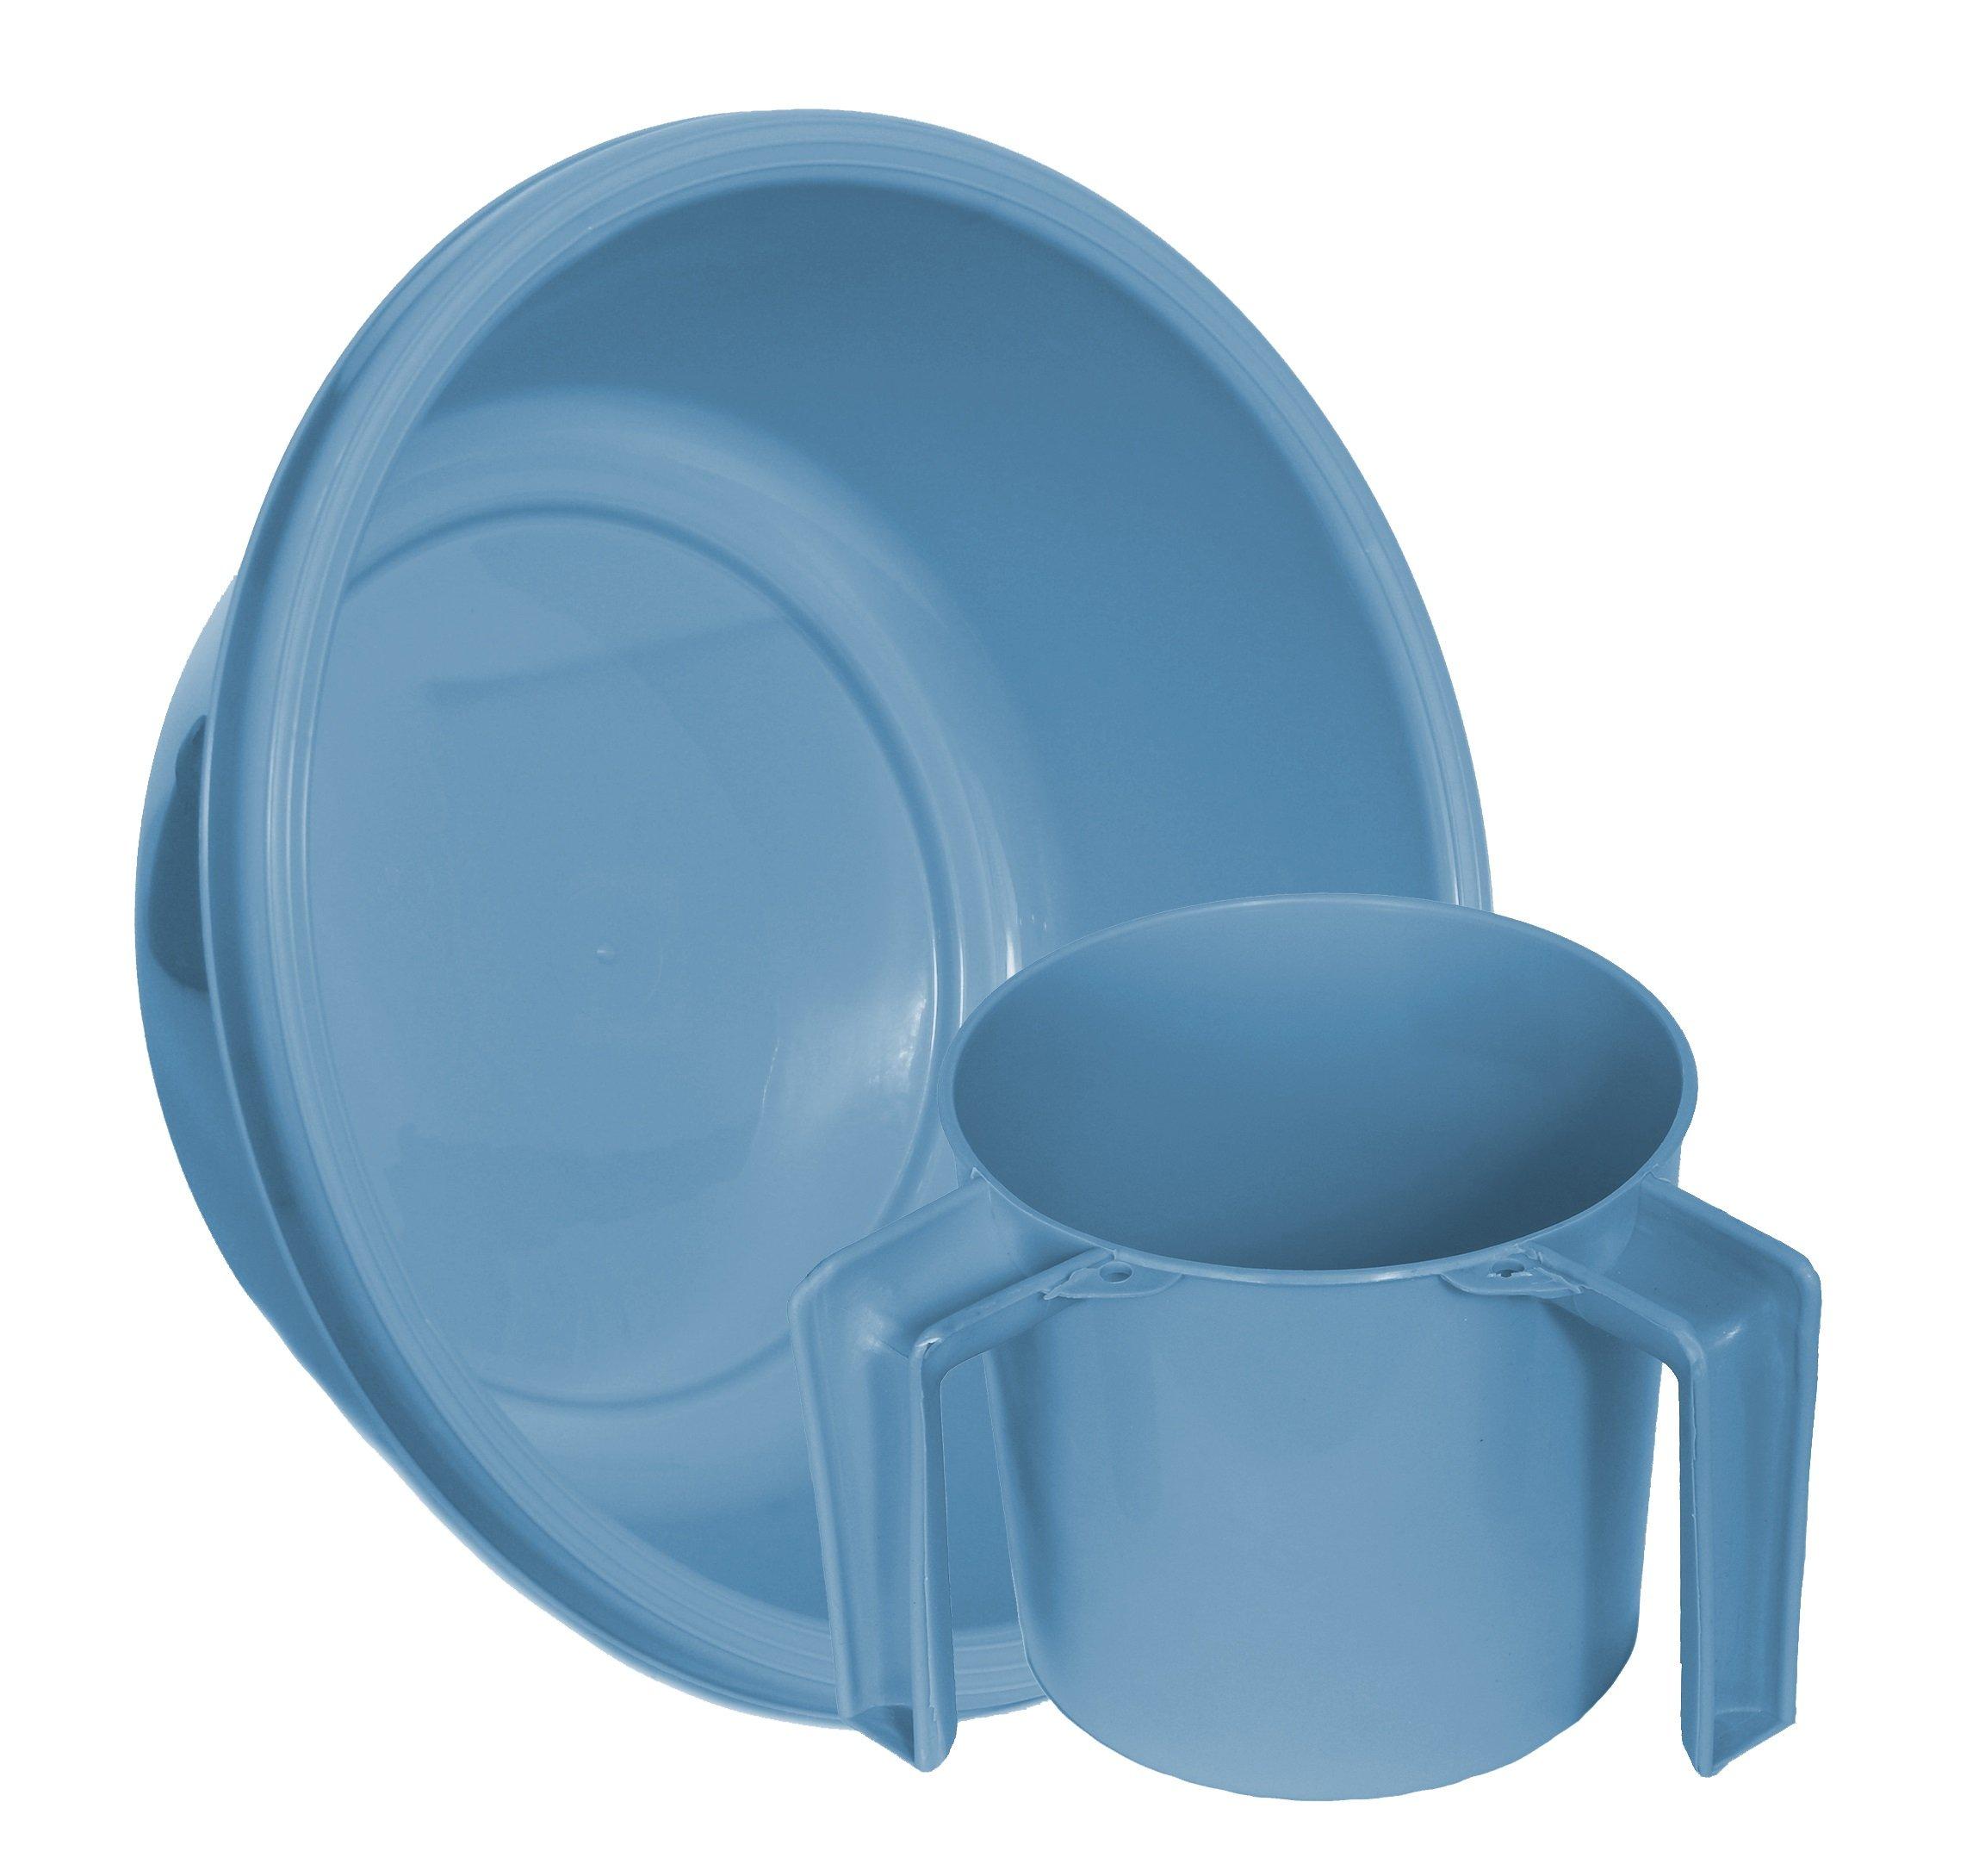 YBM Home Round Wash Cup & Round Wash Basin Netilat Yadayim, Negel Vasser Set Ba157-1147set (1, Light Blue)